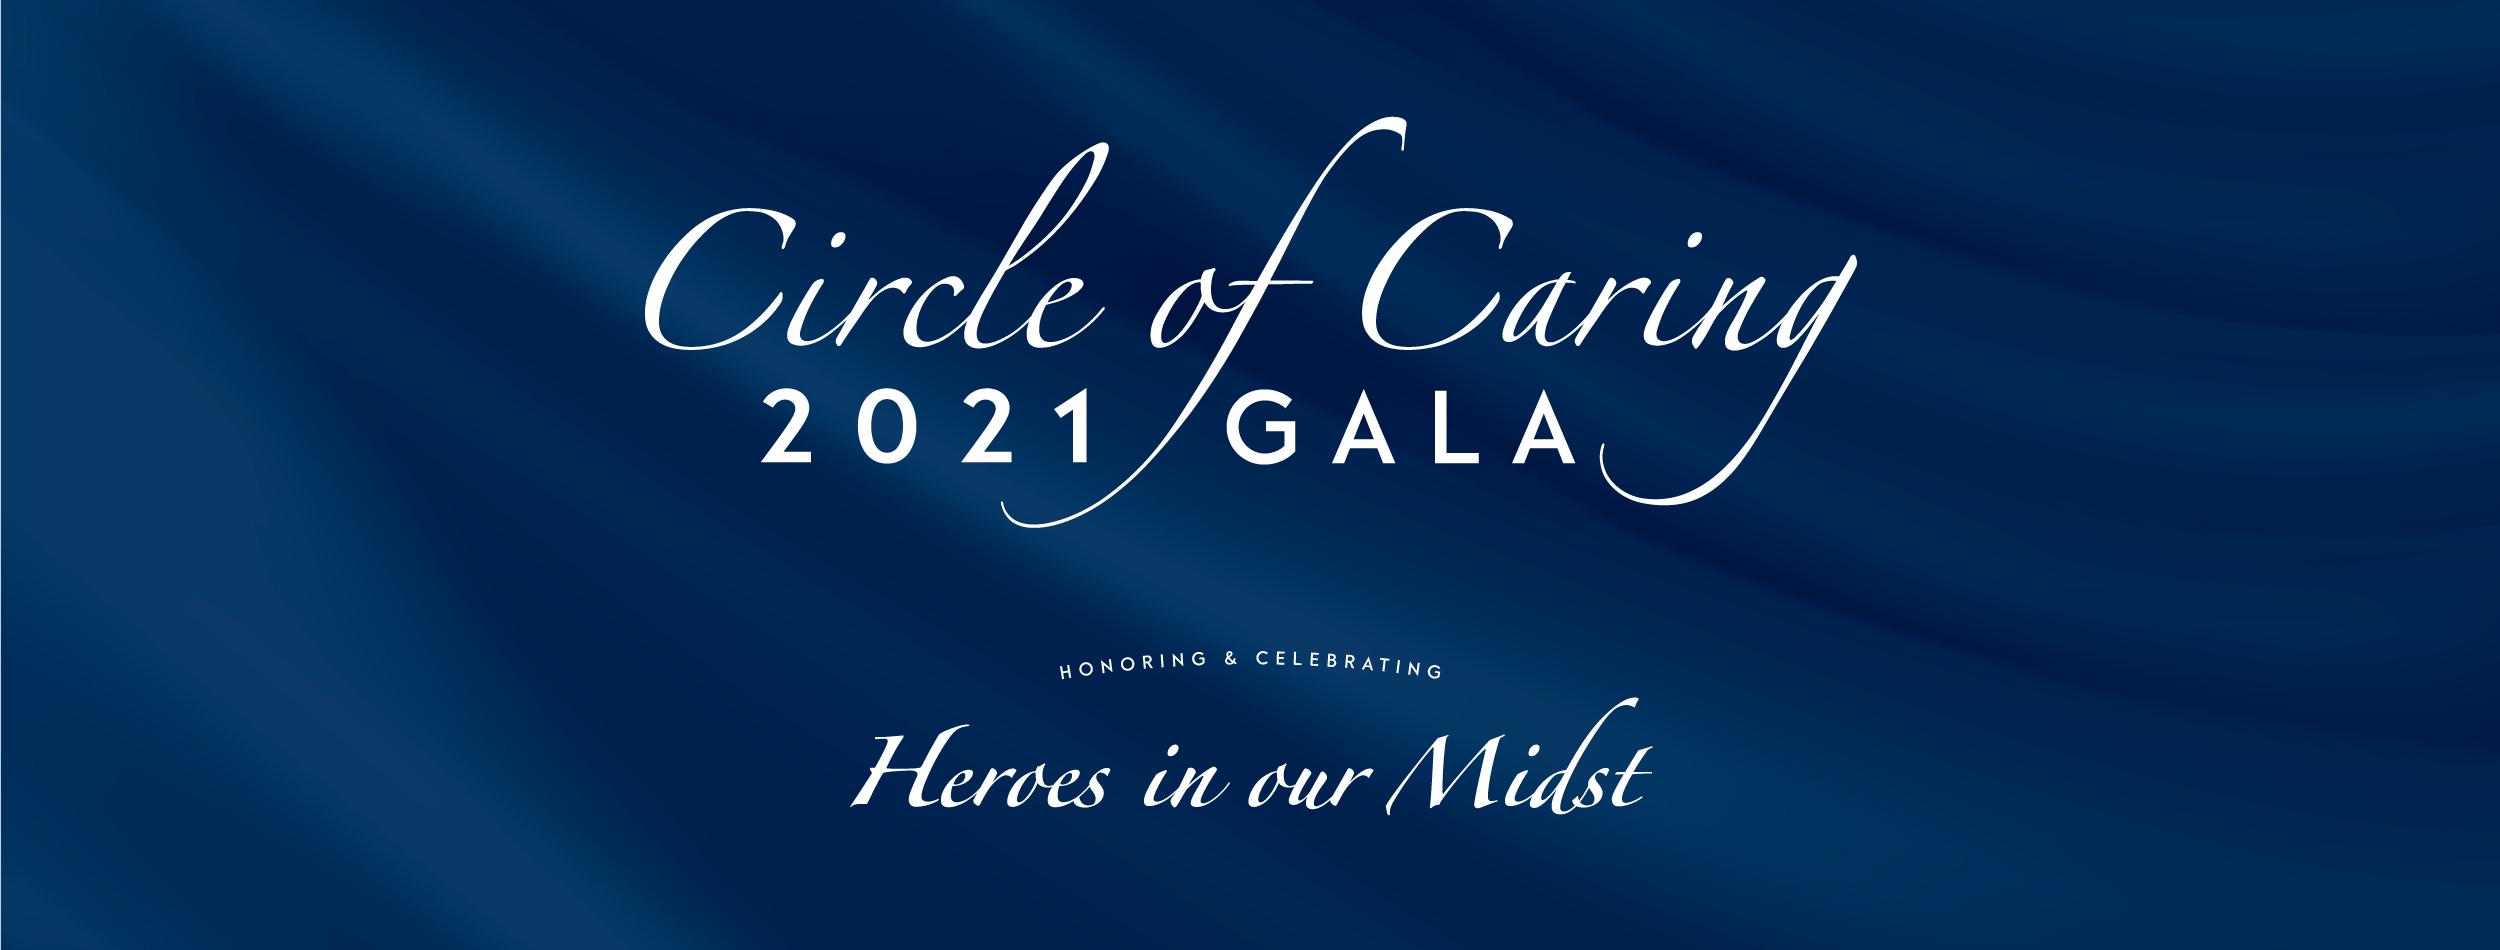 2021 Circle of Caring Gala | Volunteers in Medicine Clinic